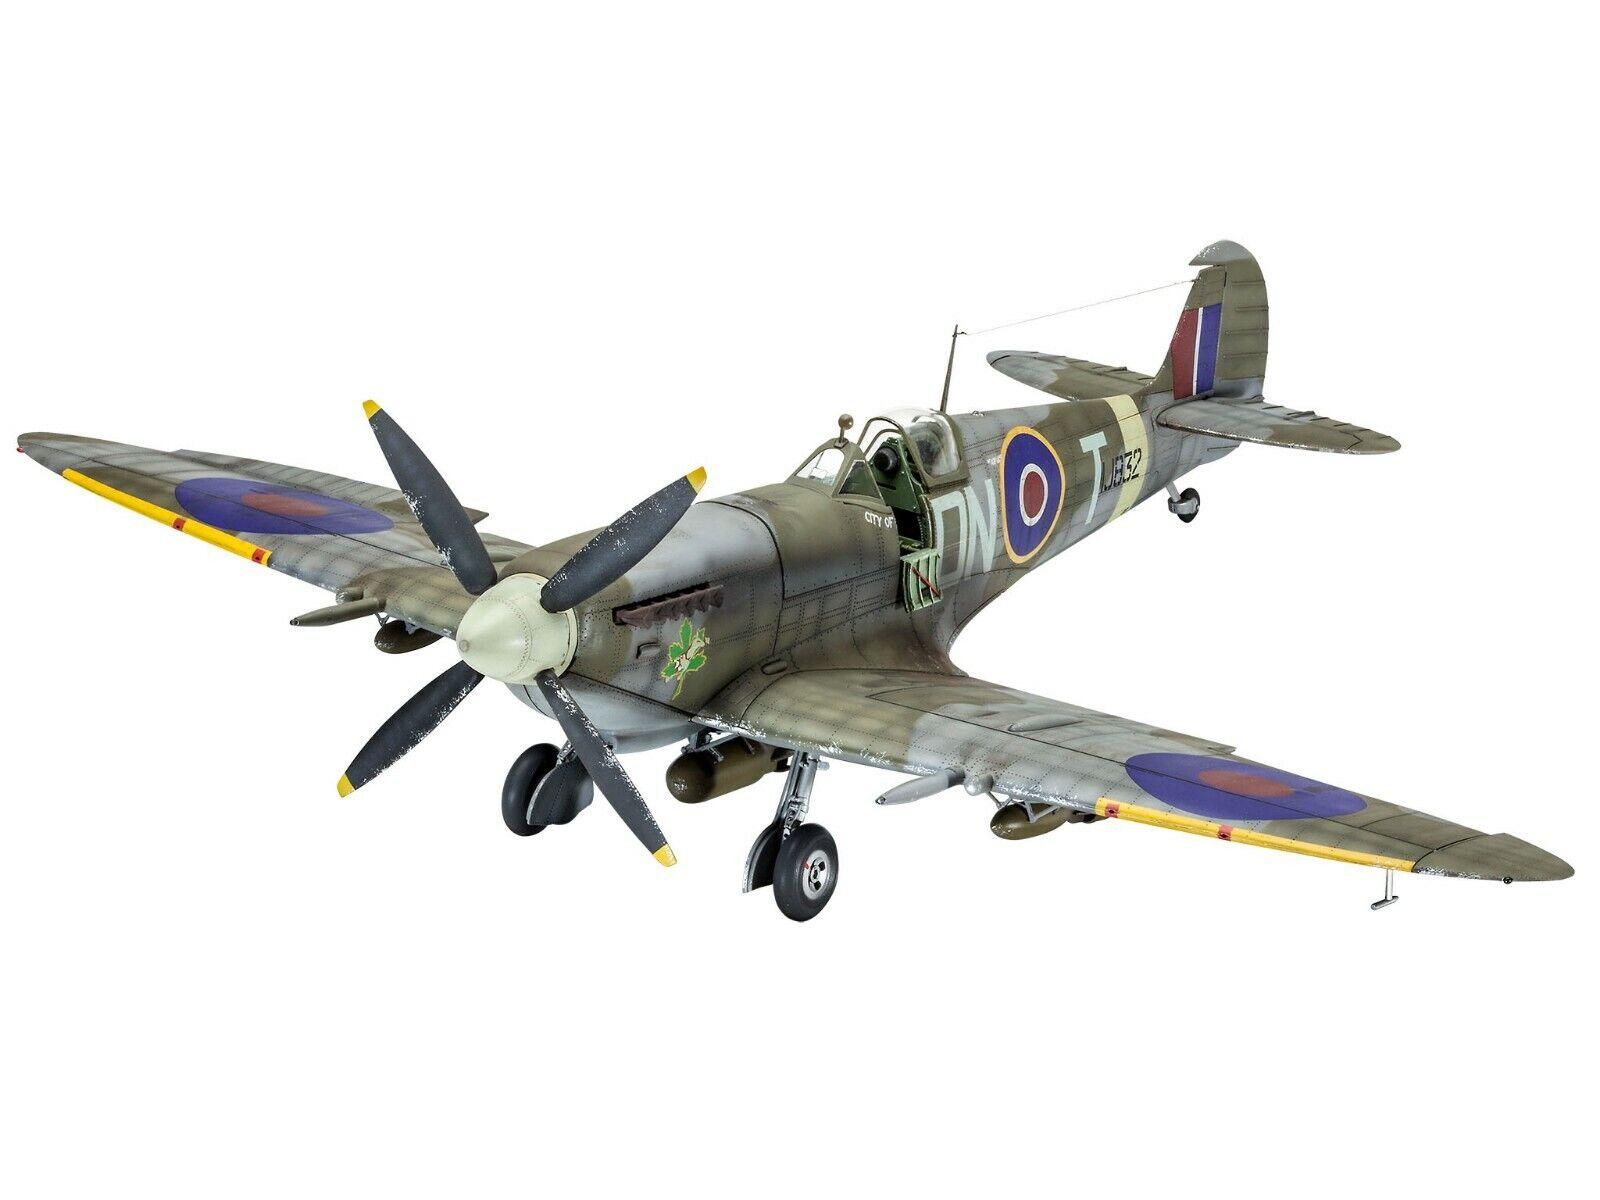 excelentes precios Revell 03927 - súpermarine Spitfire Mk.ixc Kit Kit Kit Aviones Escala 1 32 - T48 Post  ahorra 50% -75% de descuento